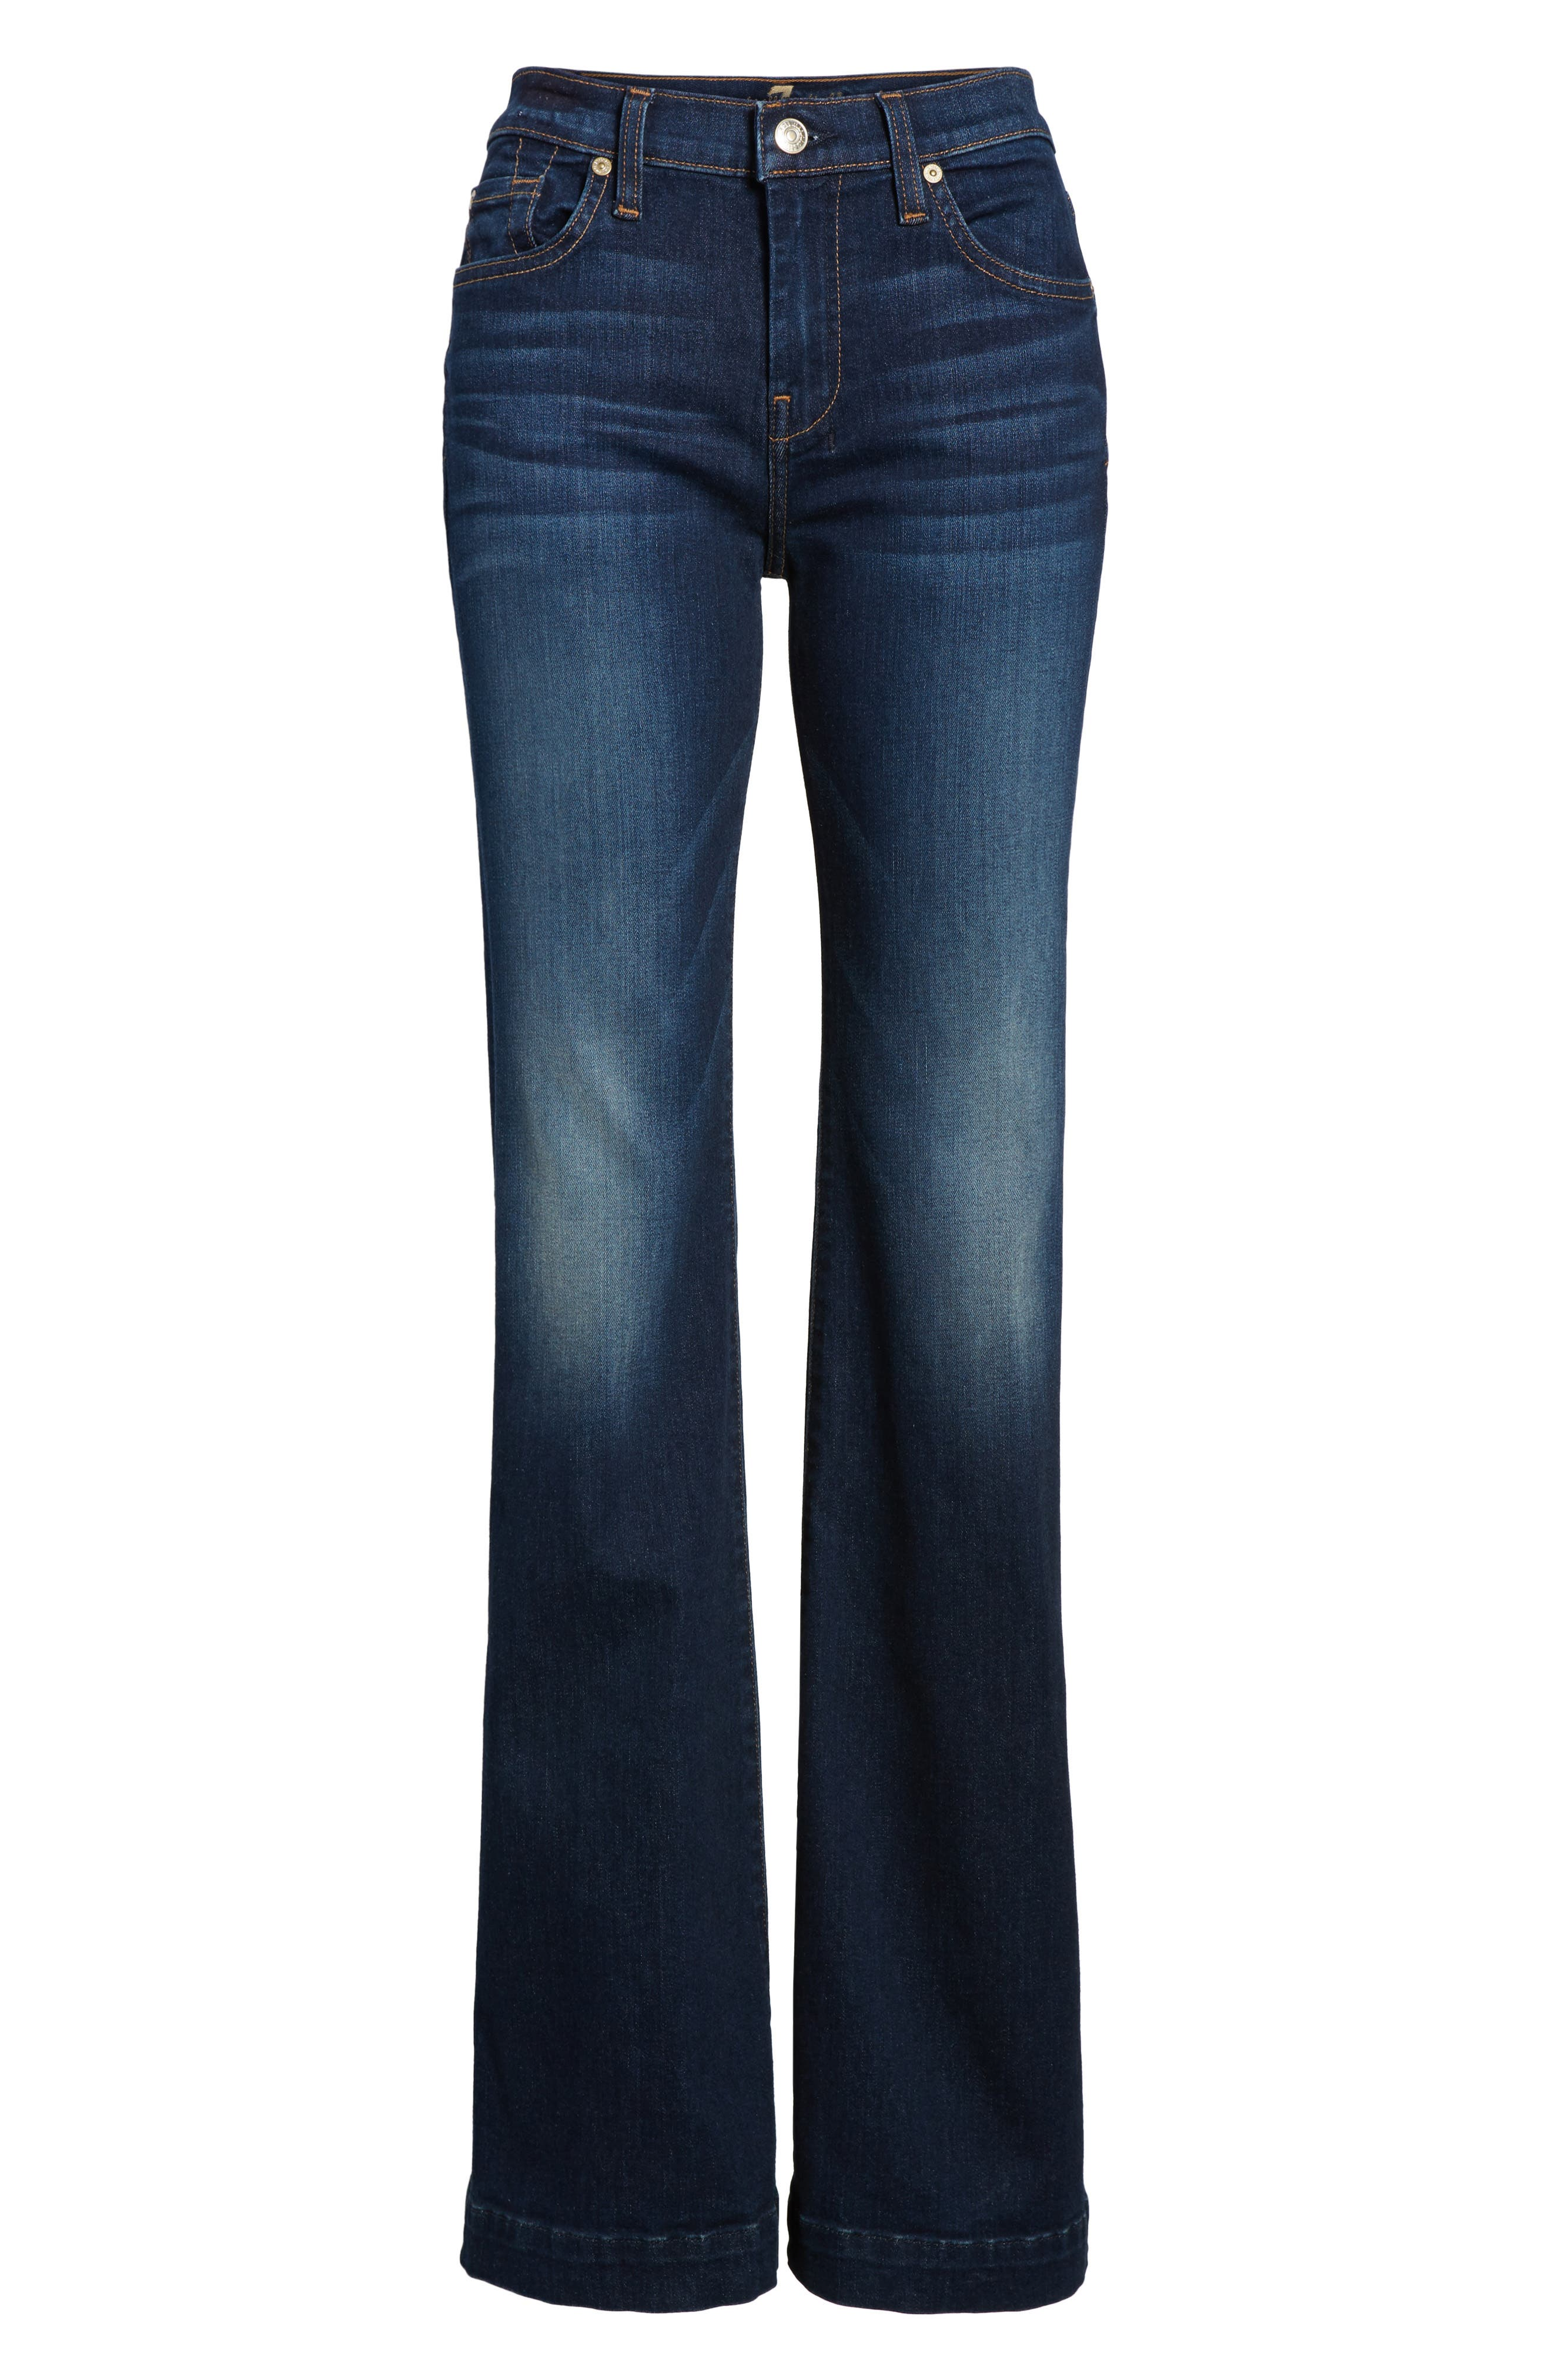 Dojo Wide Leg Jeans,                             Alternate thumbnail 7, color,                             MORENO